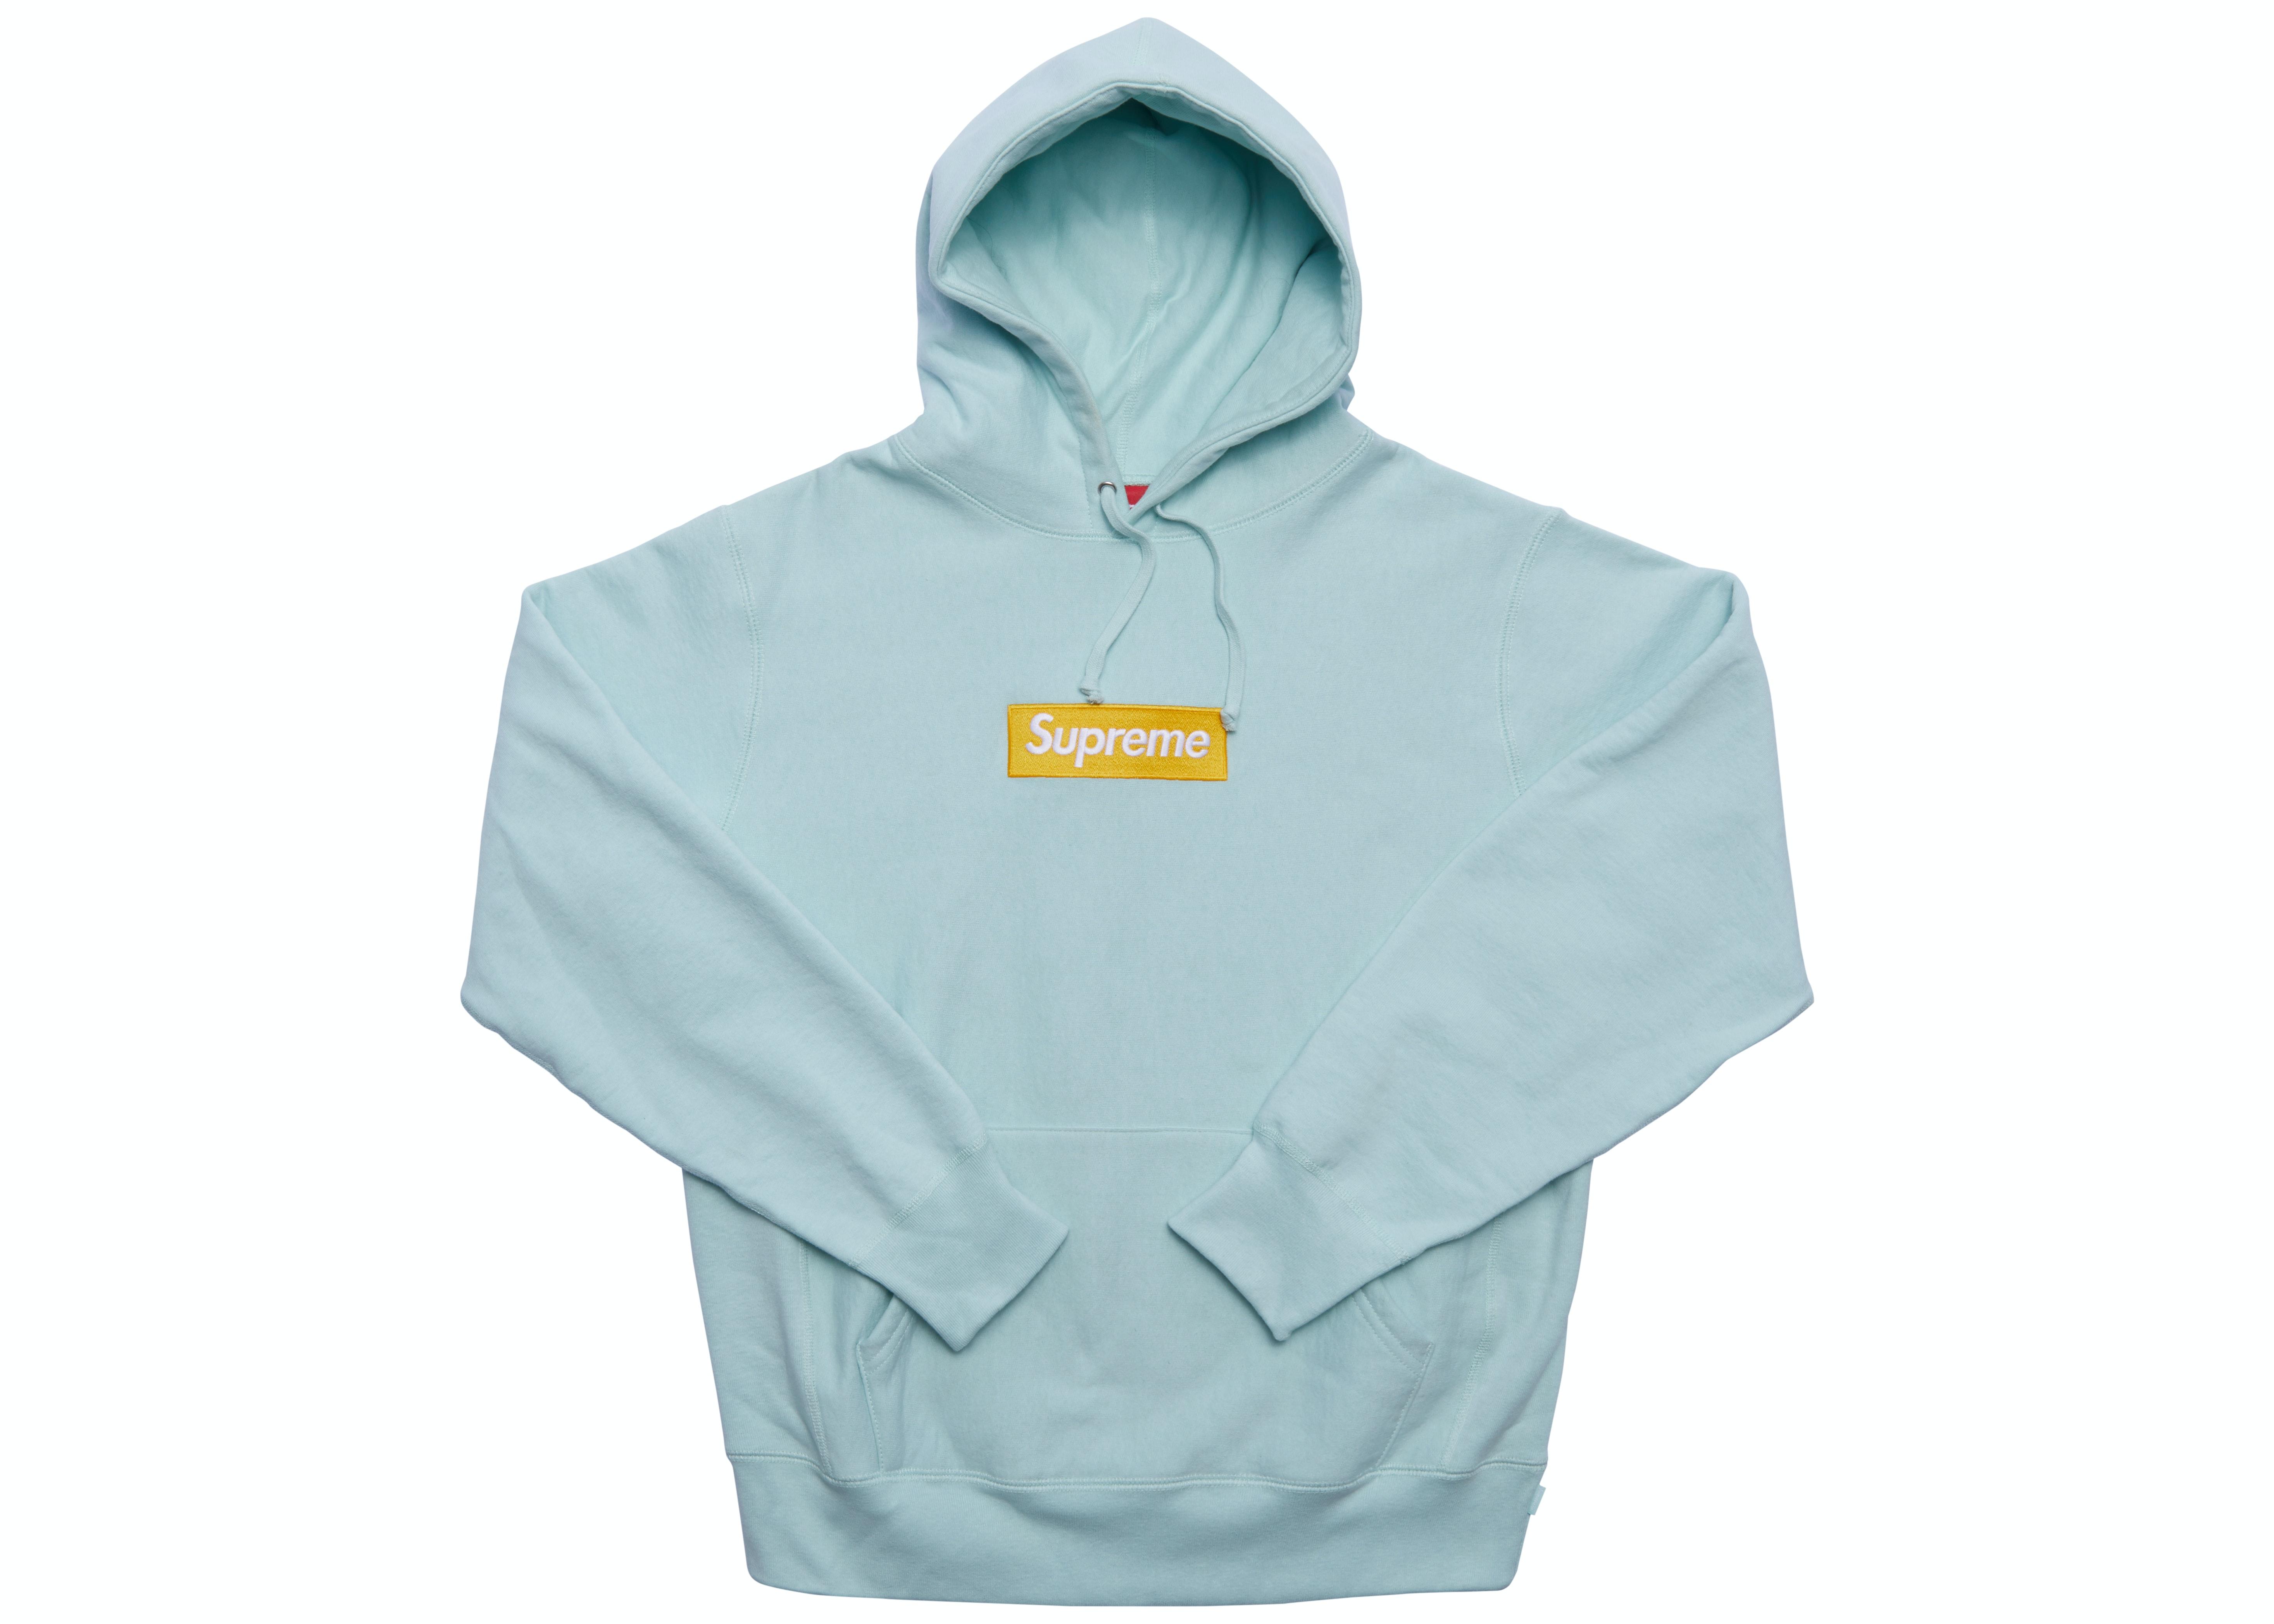 Supreme Box Logo Hooded Sweatshirt (FW17) Ice Blue